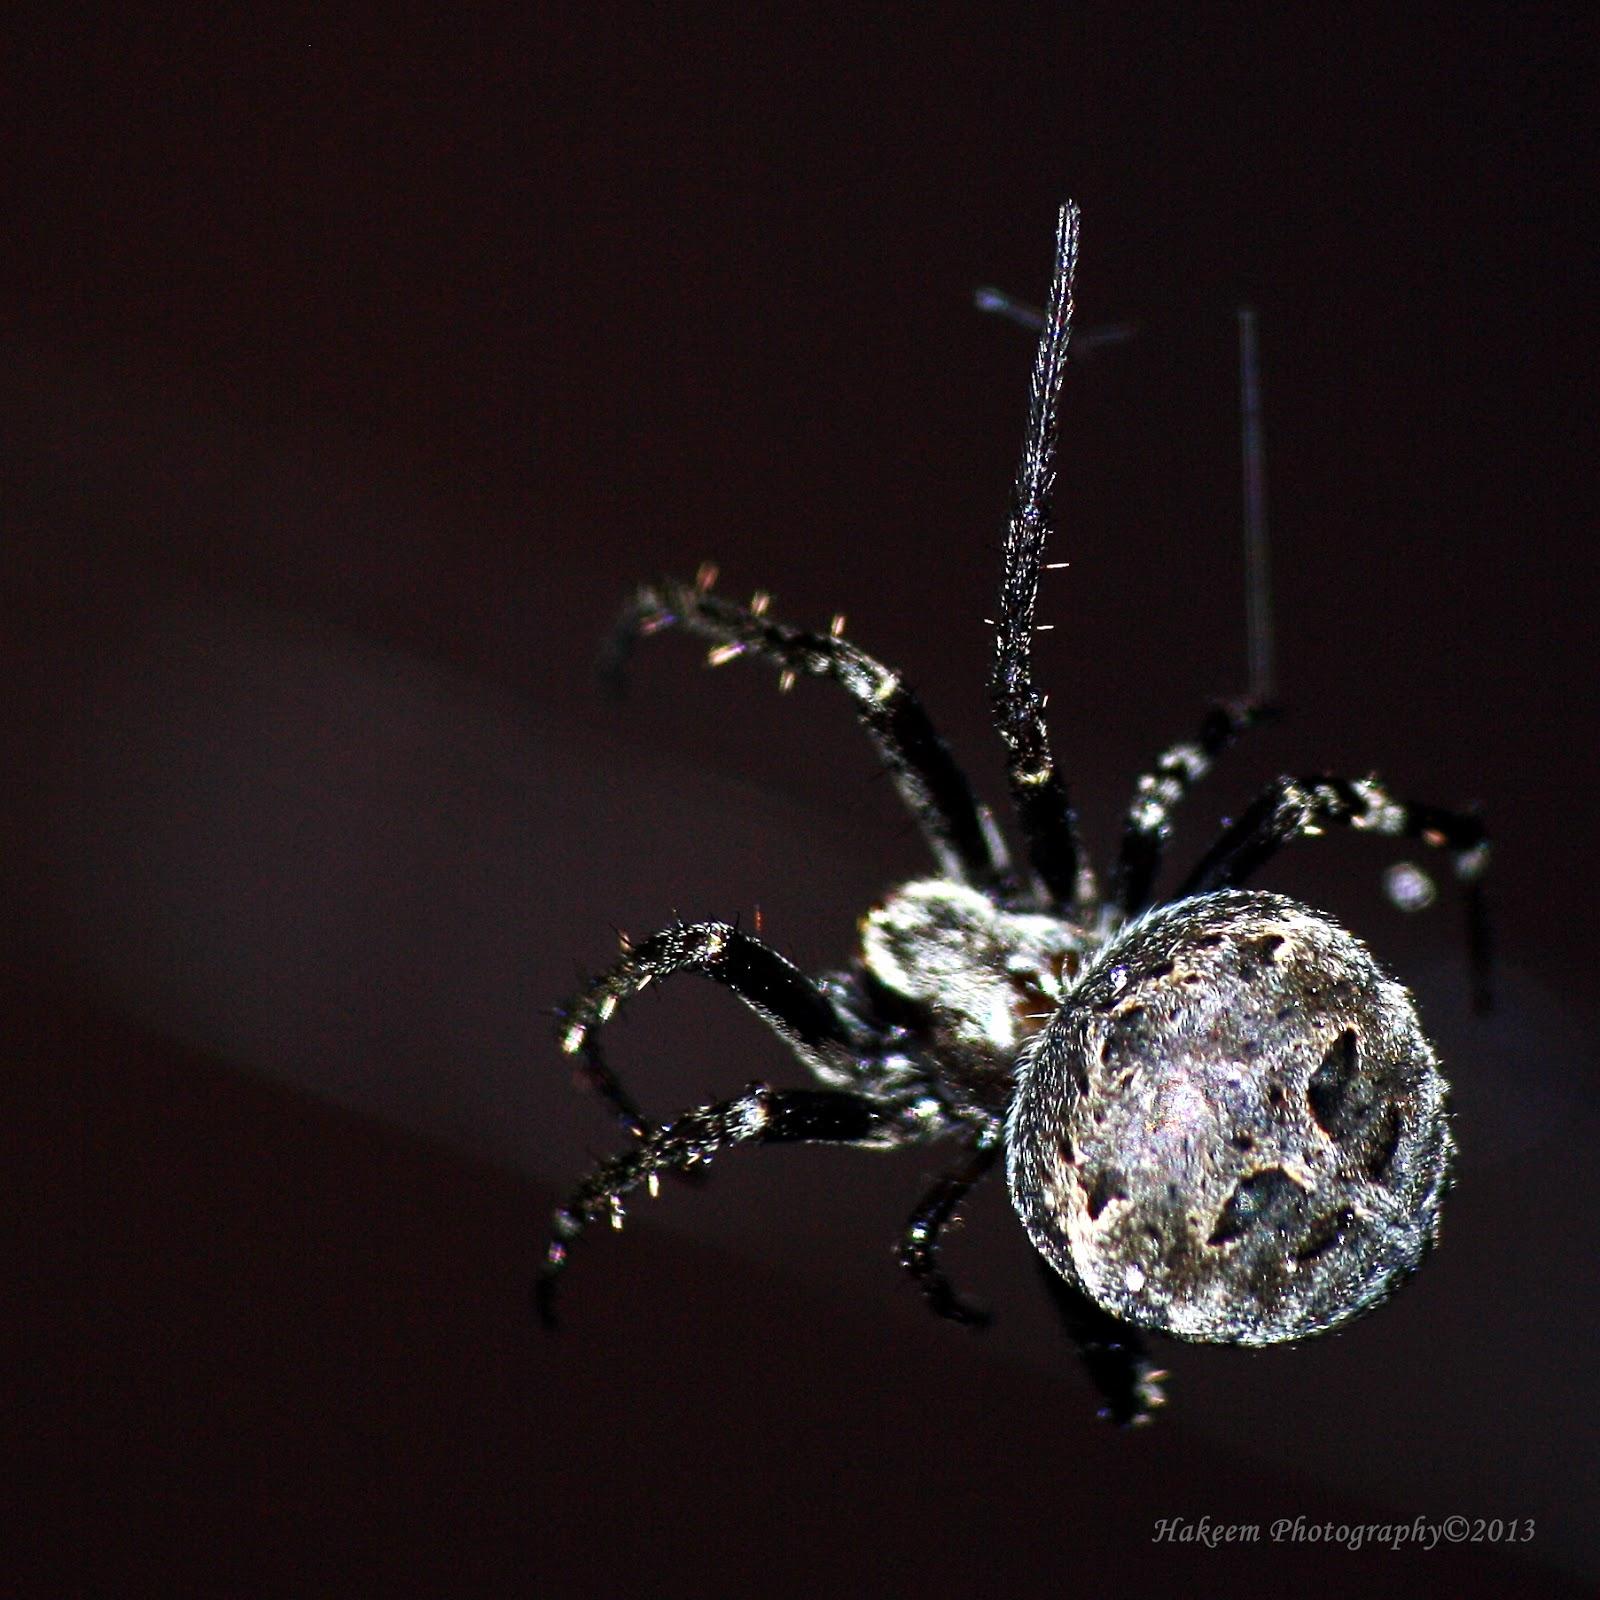 House Spider 4